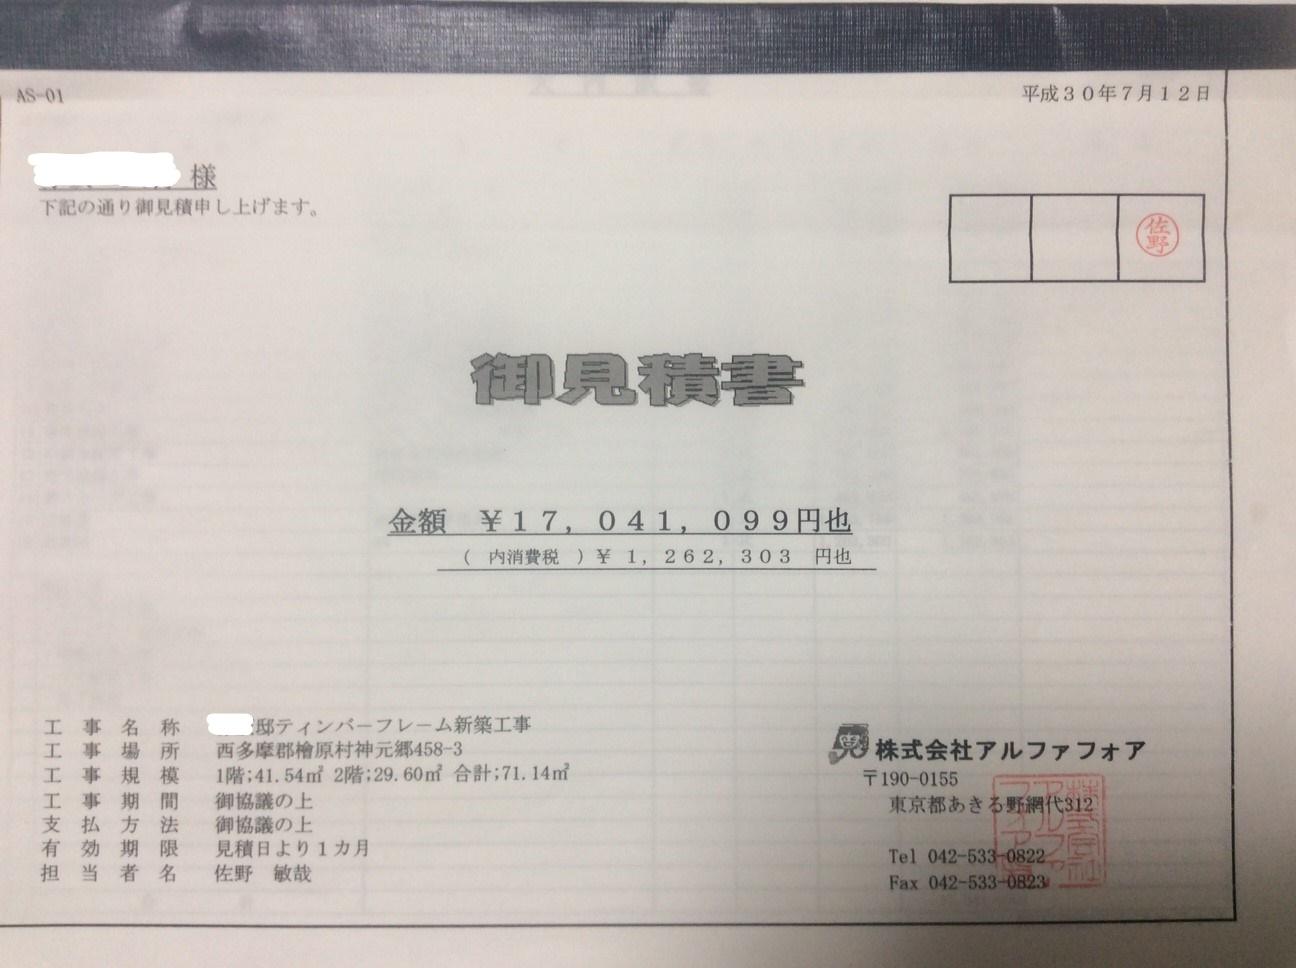 airstream-original-design-loghouse-hinohara-village-tokyo-japan-estimate